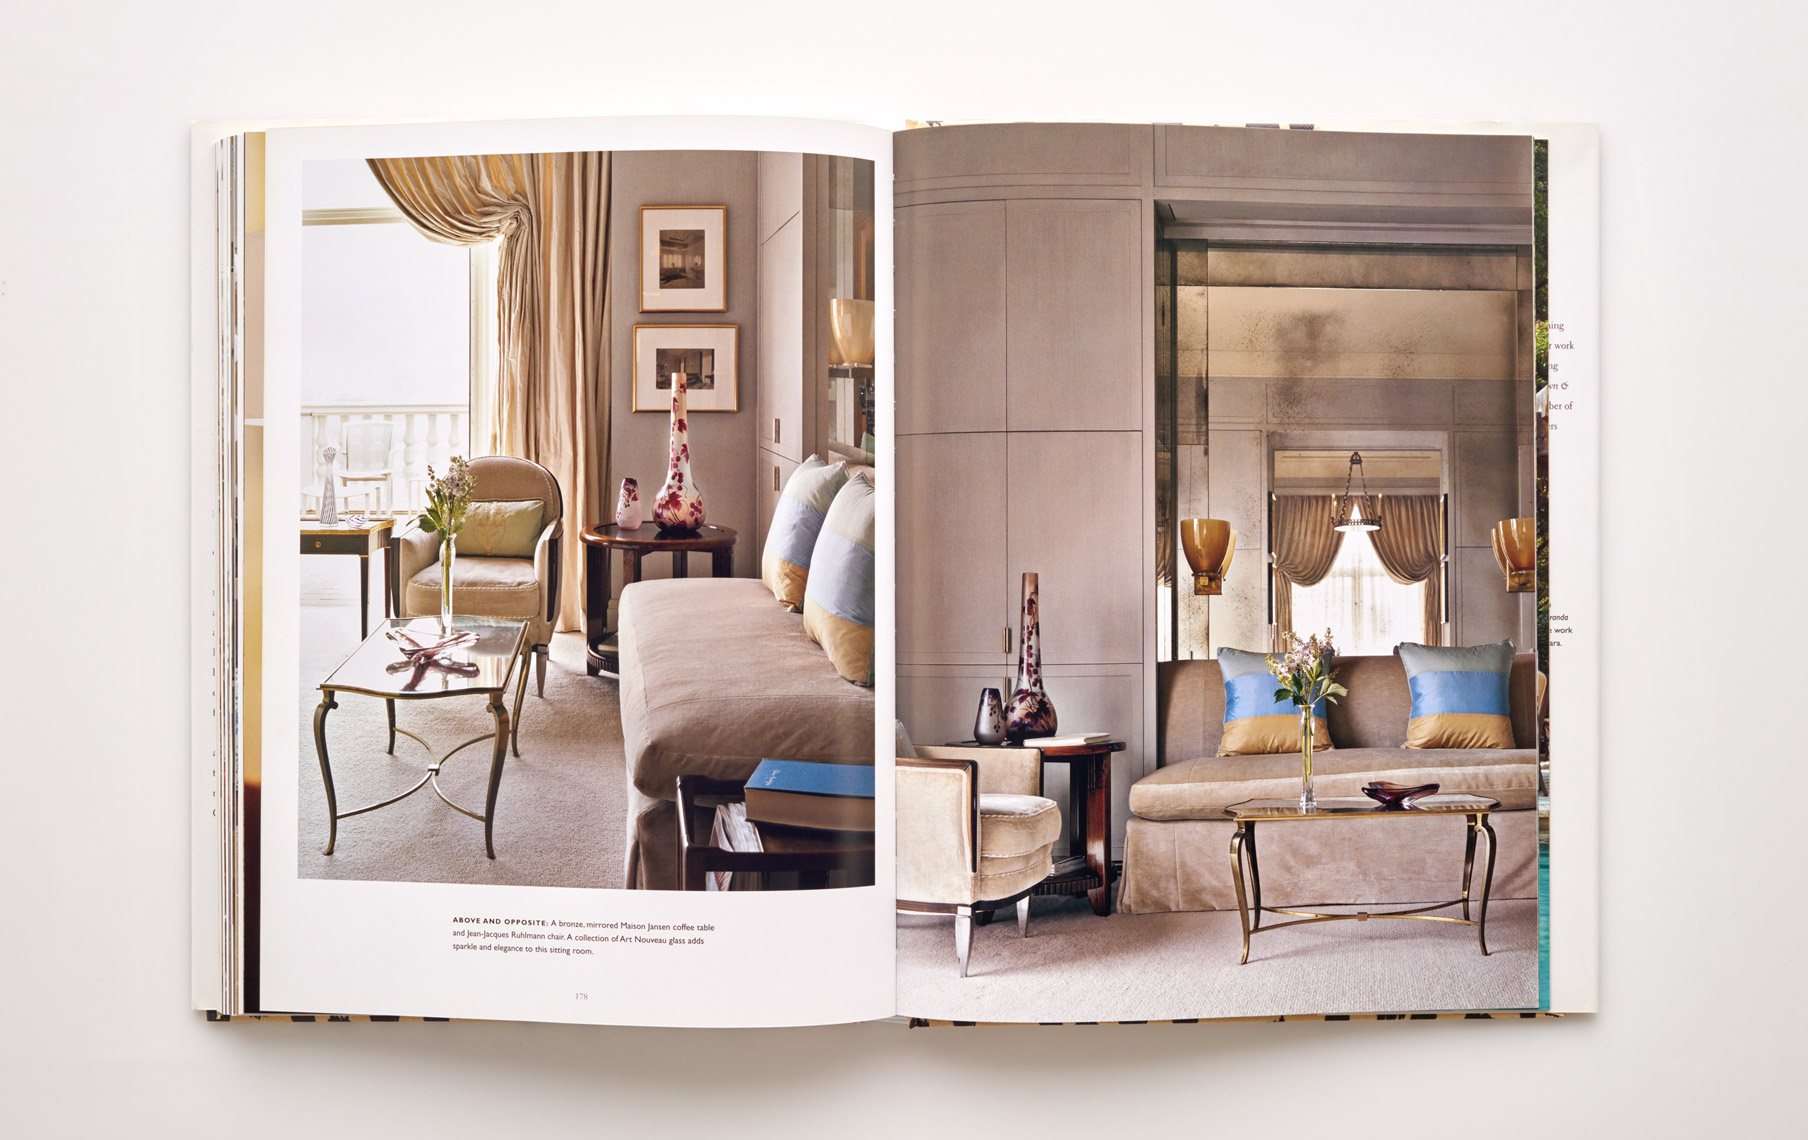 Stephen Karlisch Jan Showers Glamorous Rooms Sitting Room